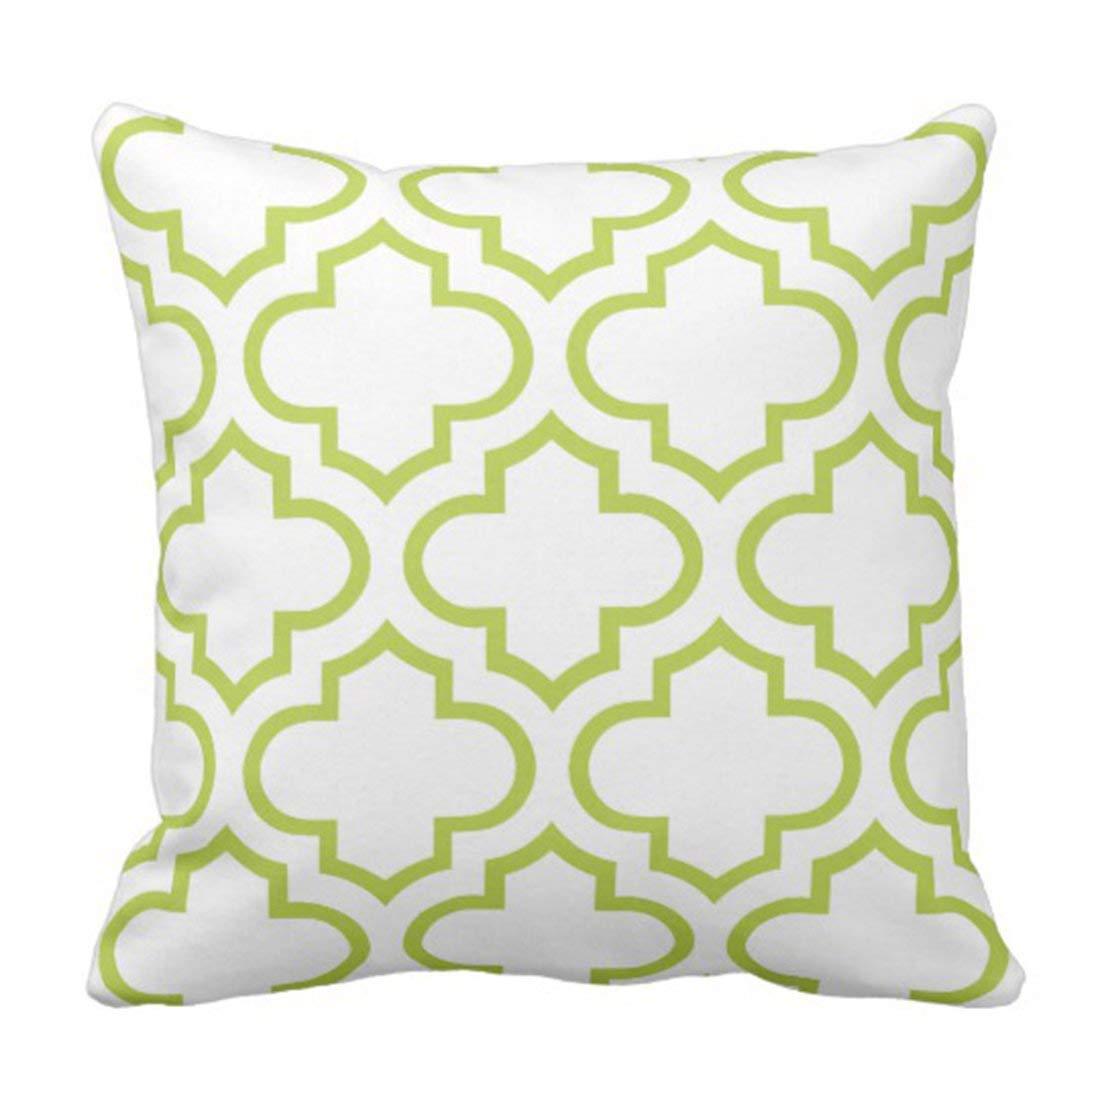 WOPOP Colorful Lattice Moroccan Pattern in Green Quatrefoil Pillowcase Cushion Cover 16x16 inches